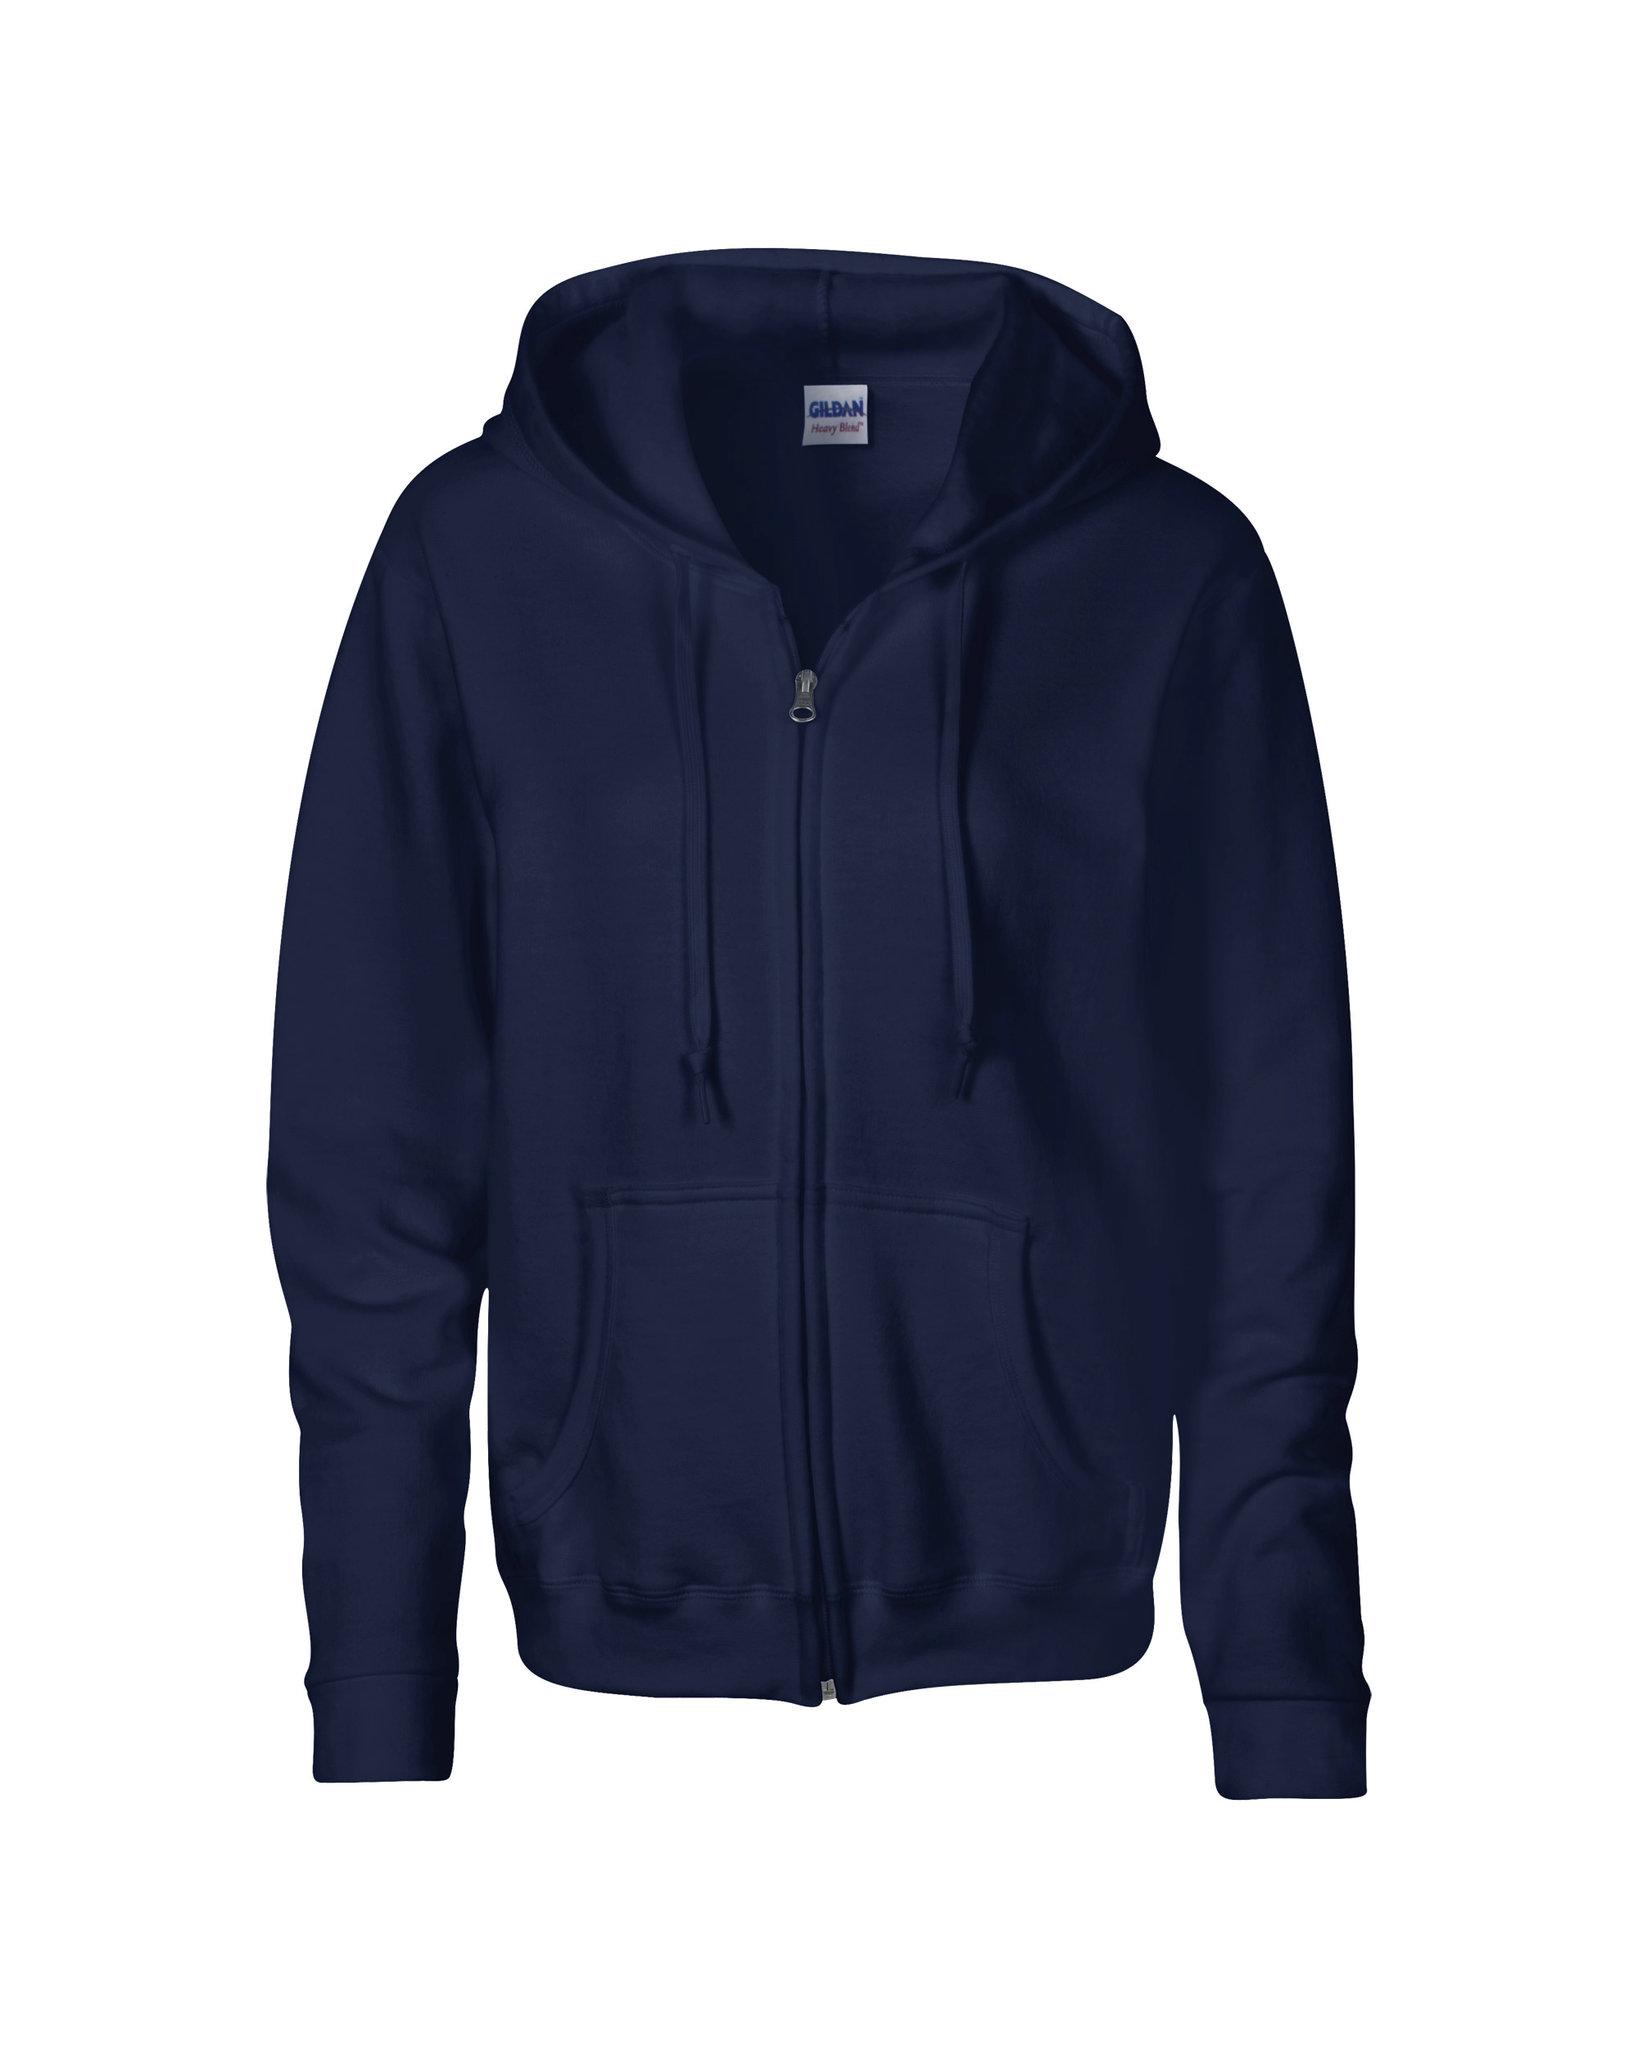 Sweatshirt personnalisable Heavy blendy noir - sweatshirt promotionnel